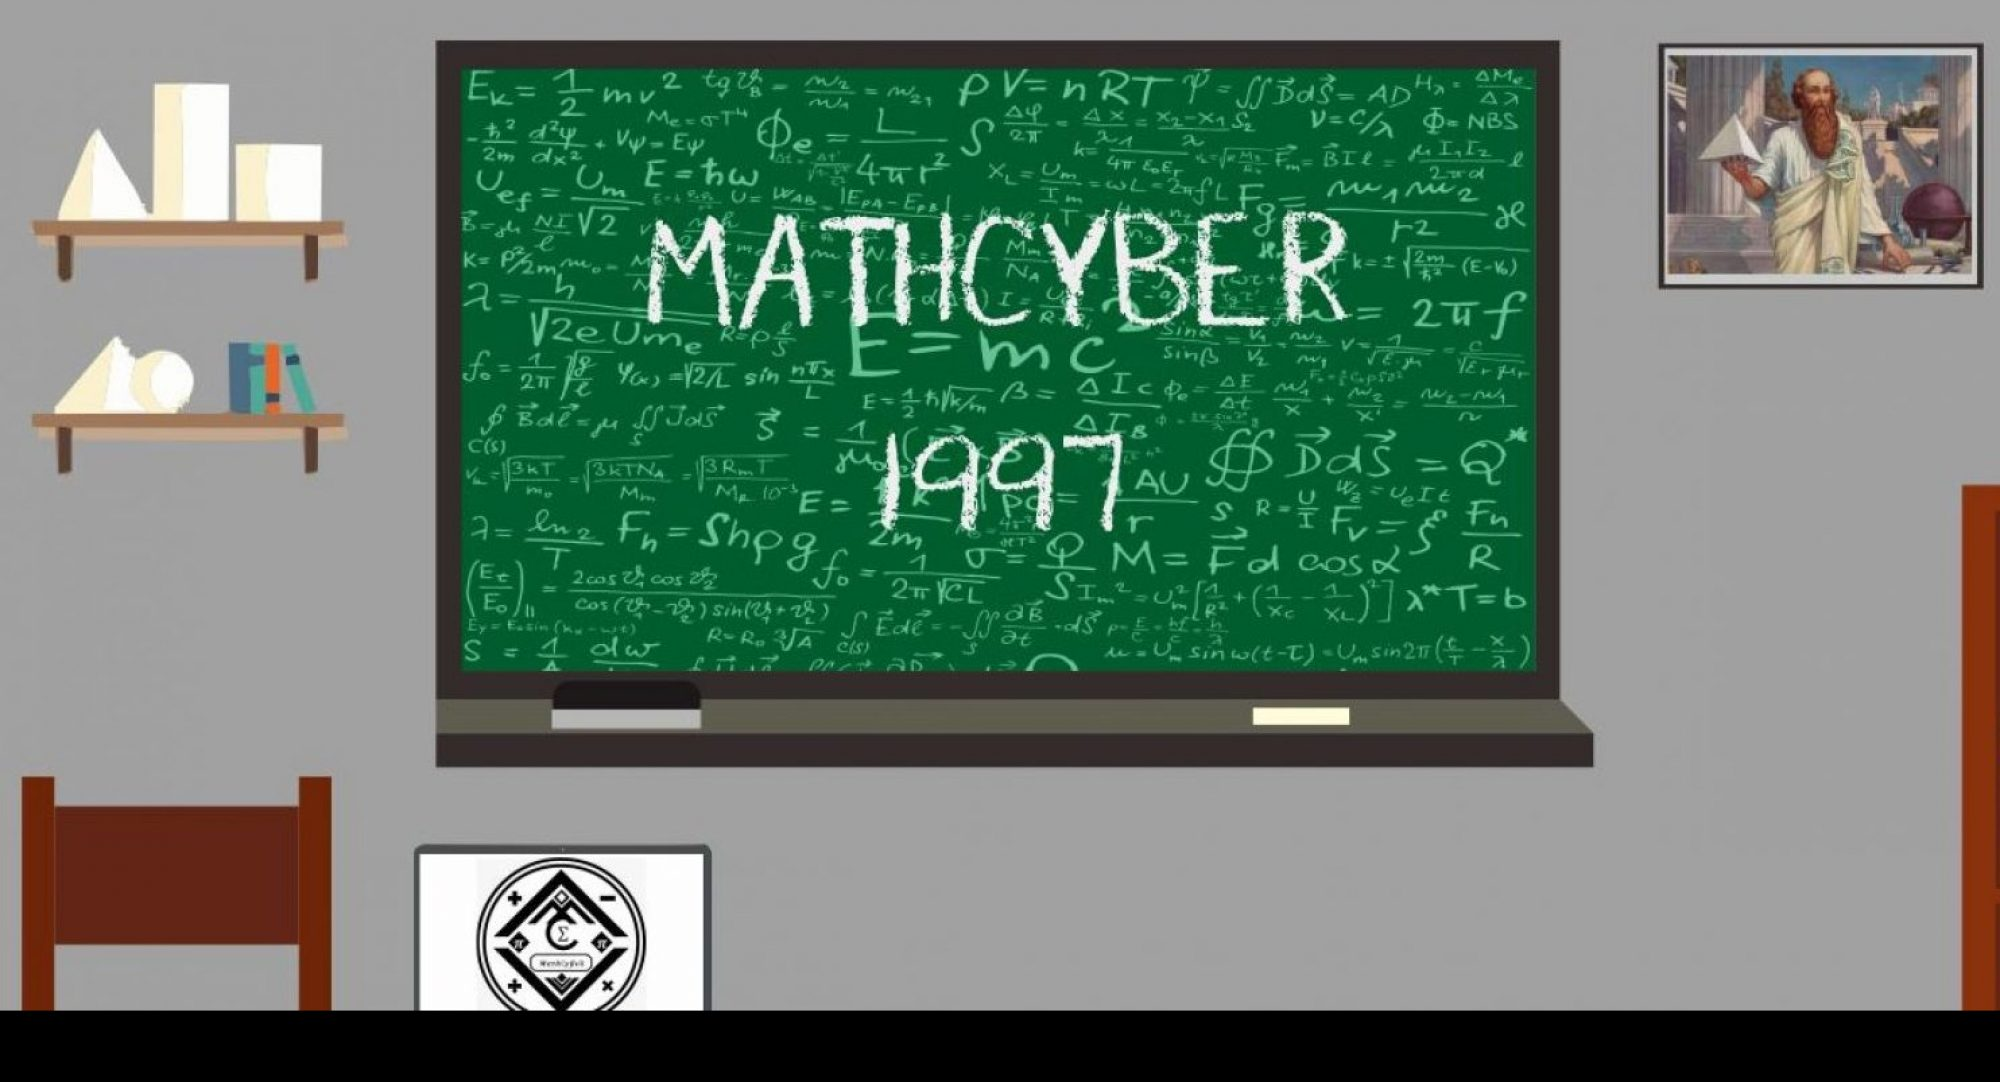 Mathcyber1997